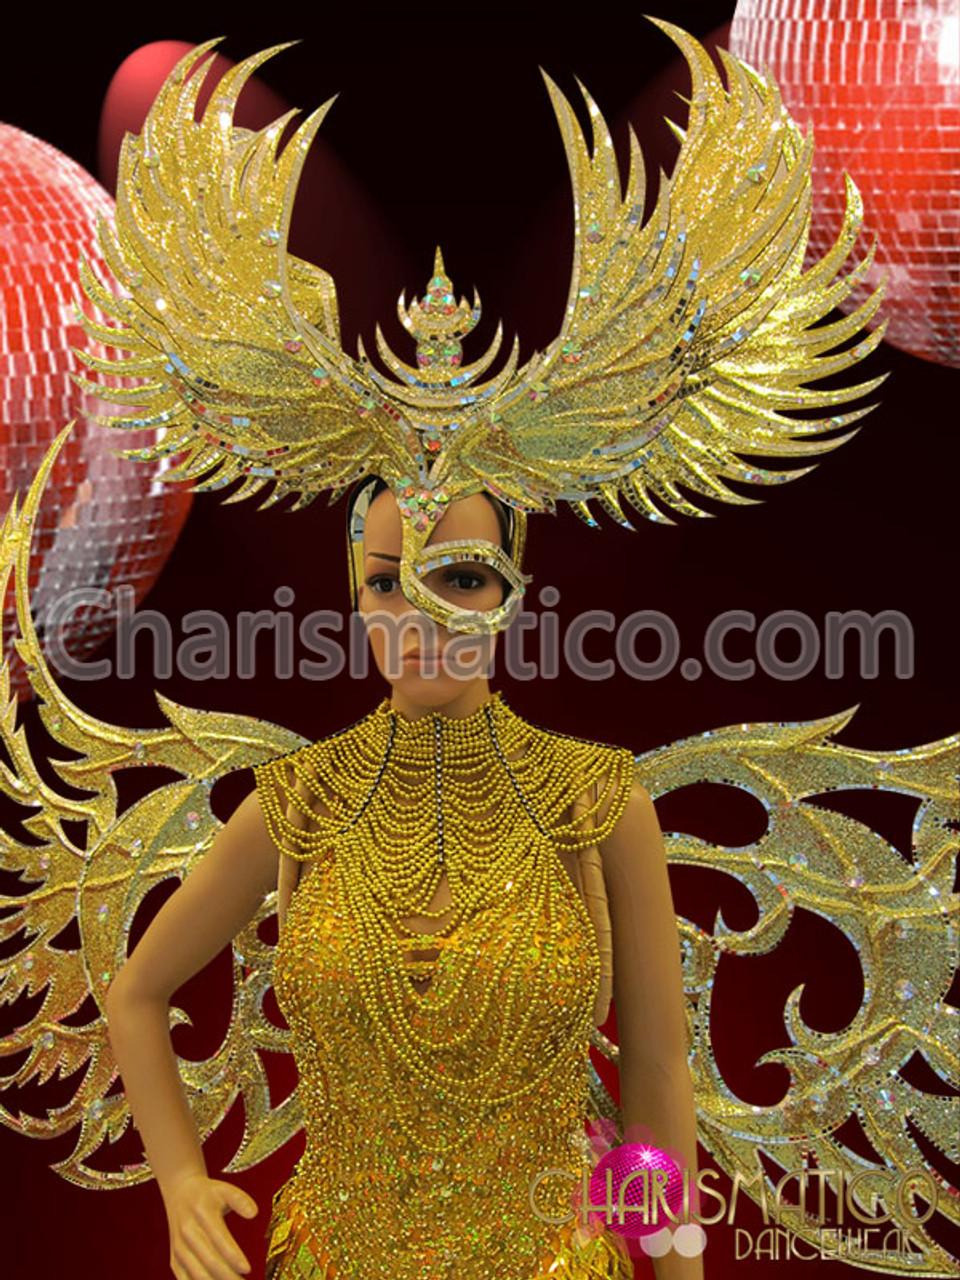 CHARISMATICO Half Mask Styled Shiny Golden Diva/'s Fancy Spiked Mohawk Headdress